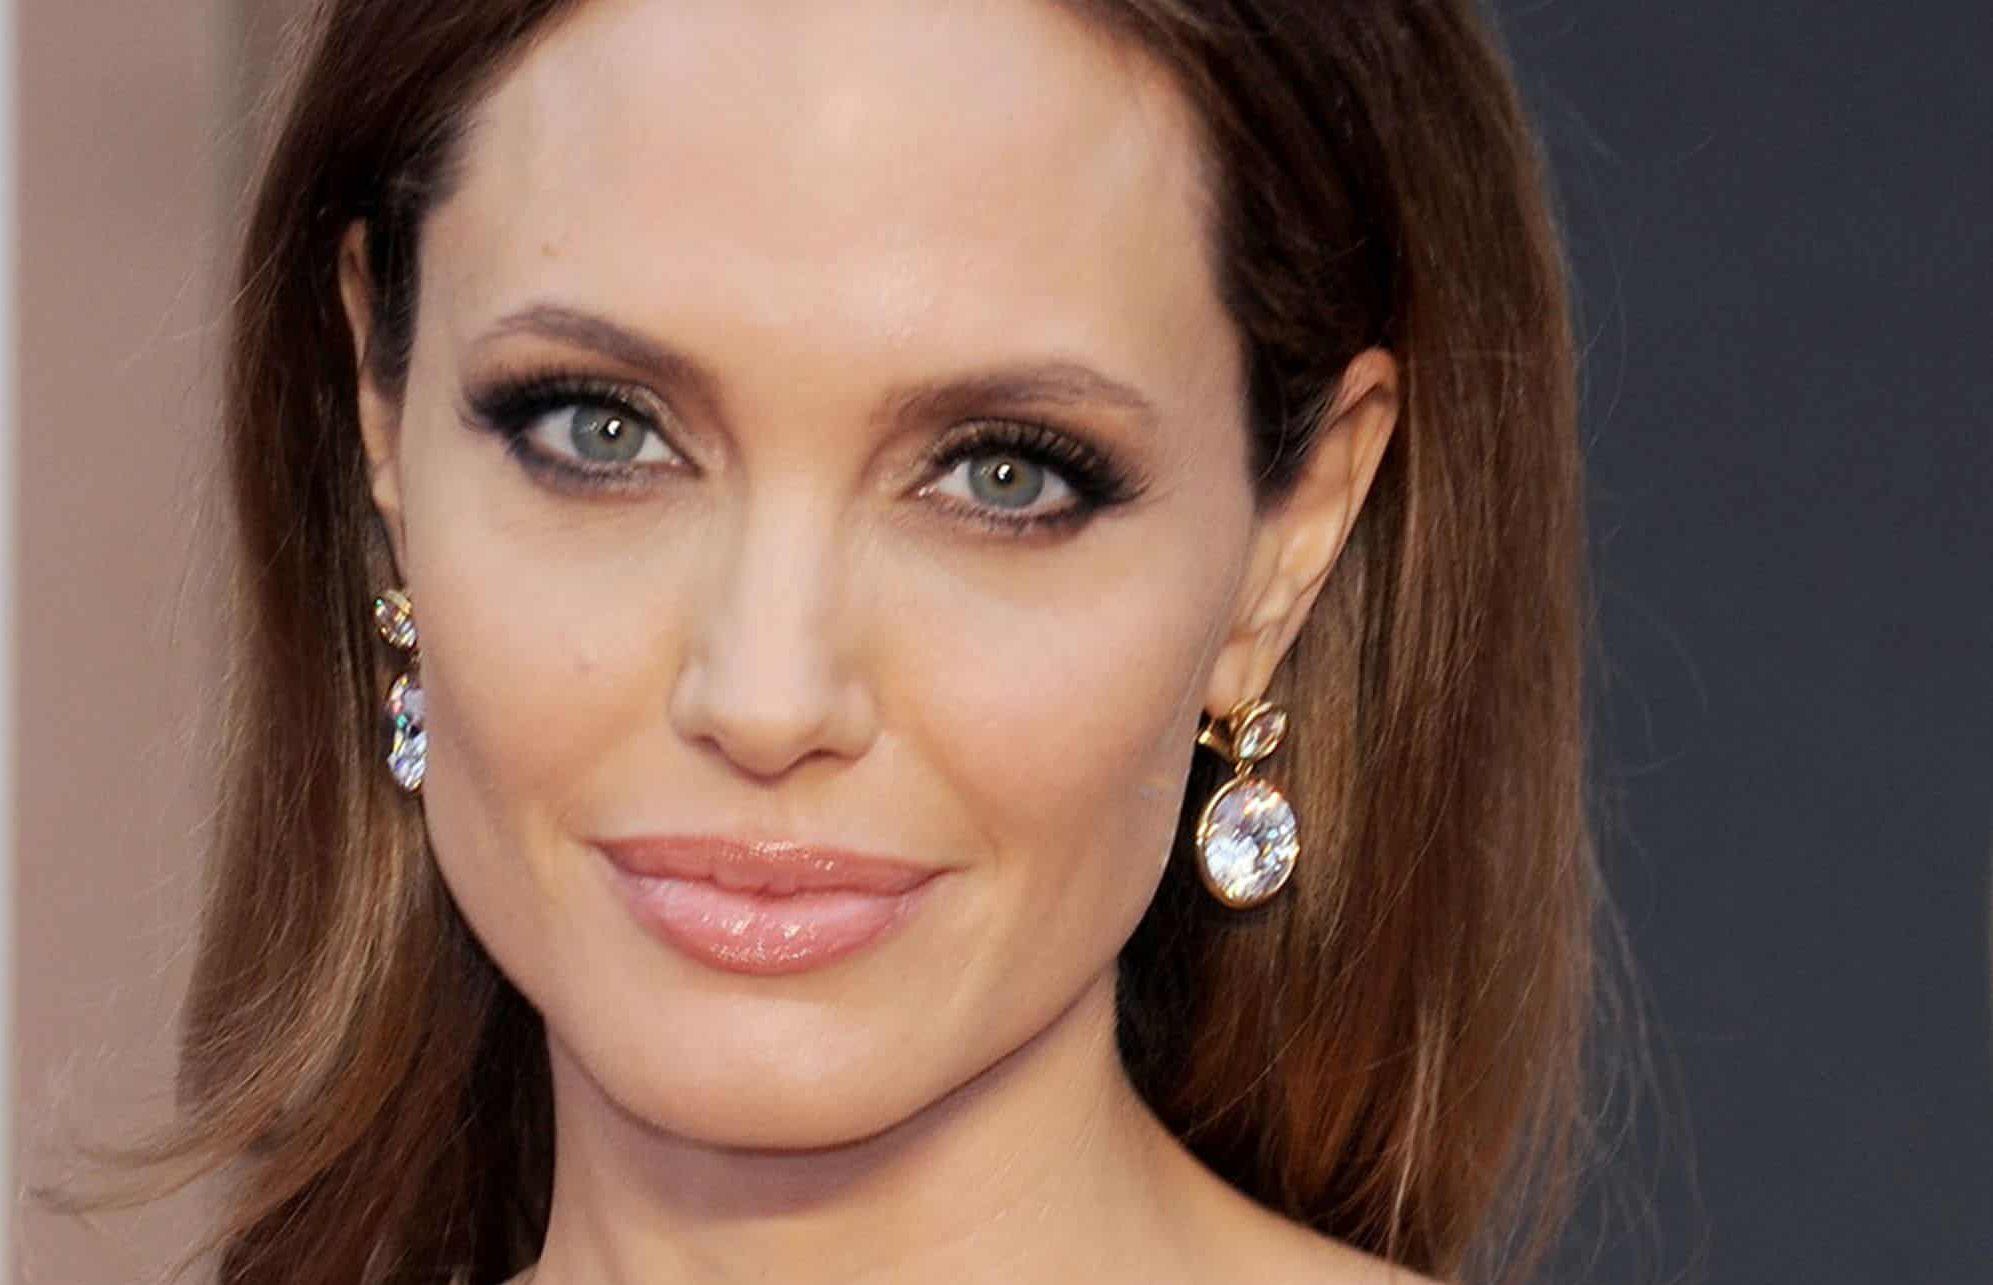 Angelina jolie pout.